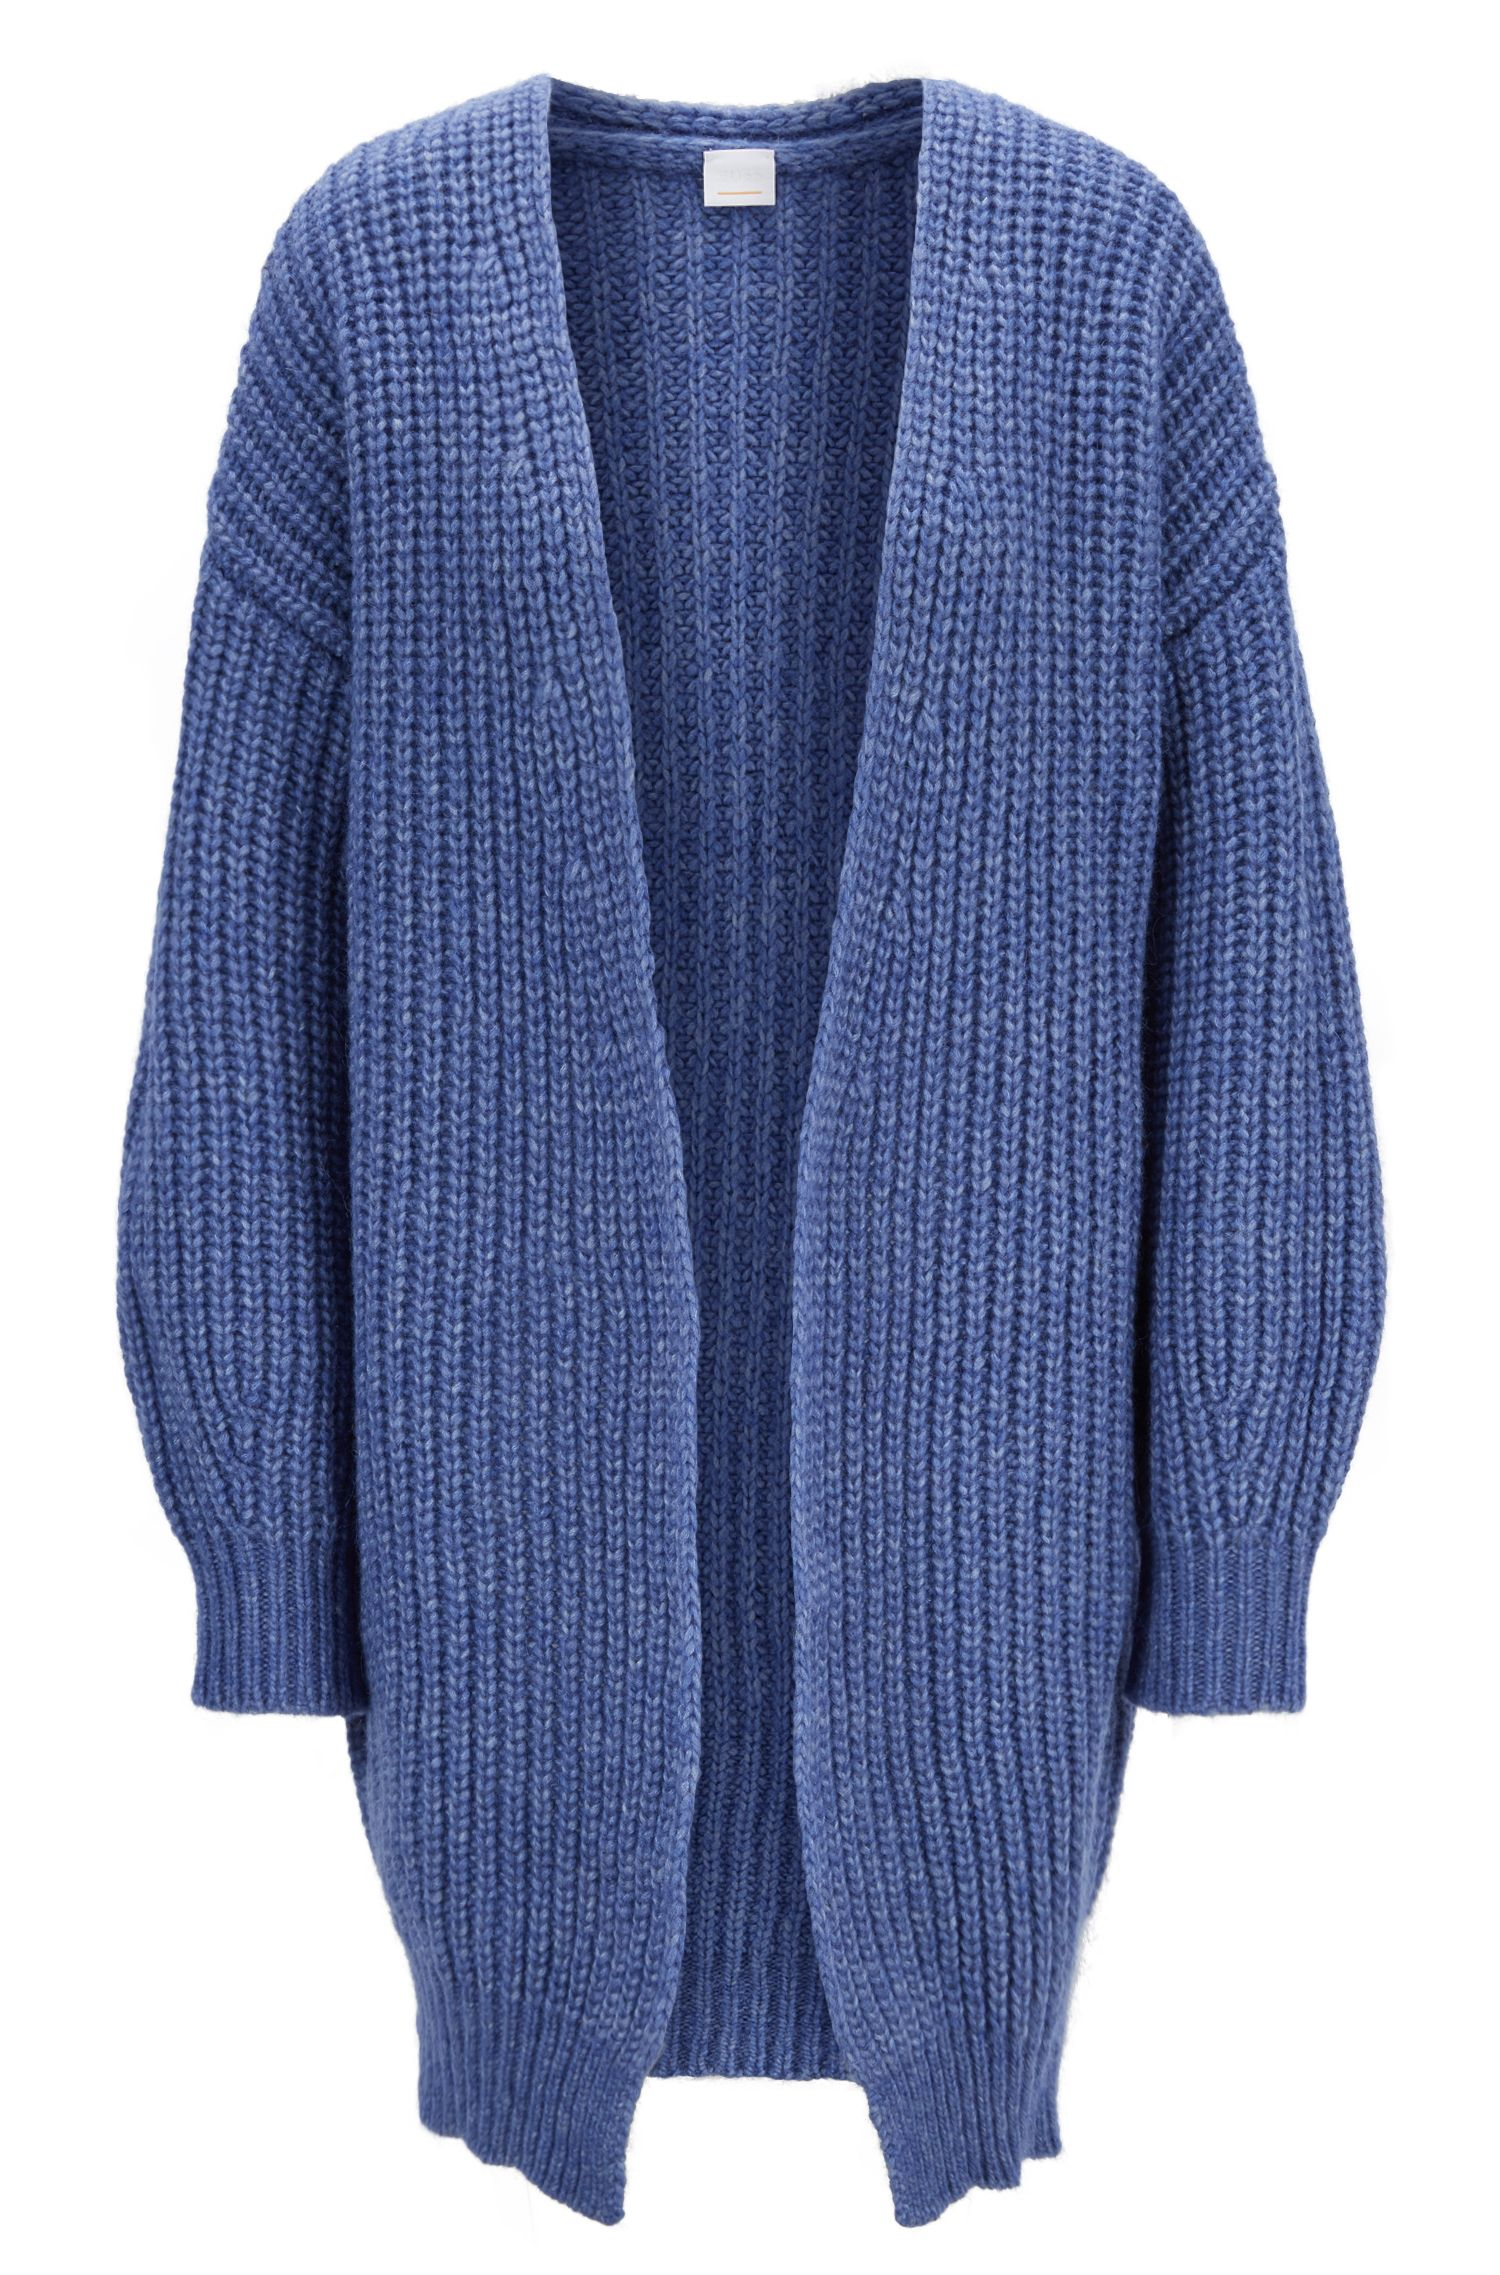 Oversized Strickjacke aus Woll-Mix, Blau